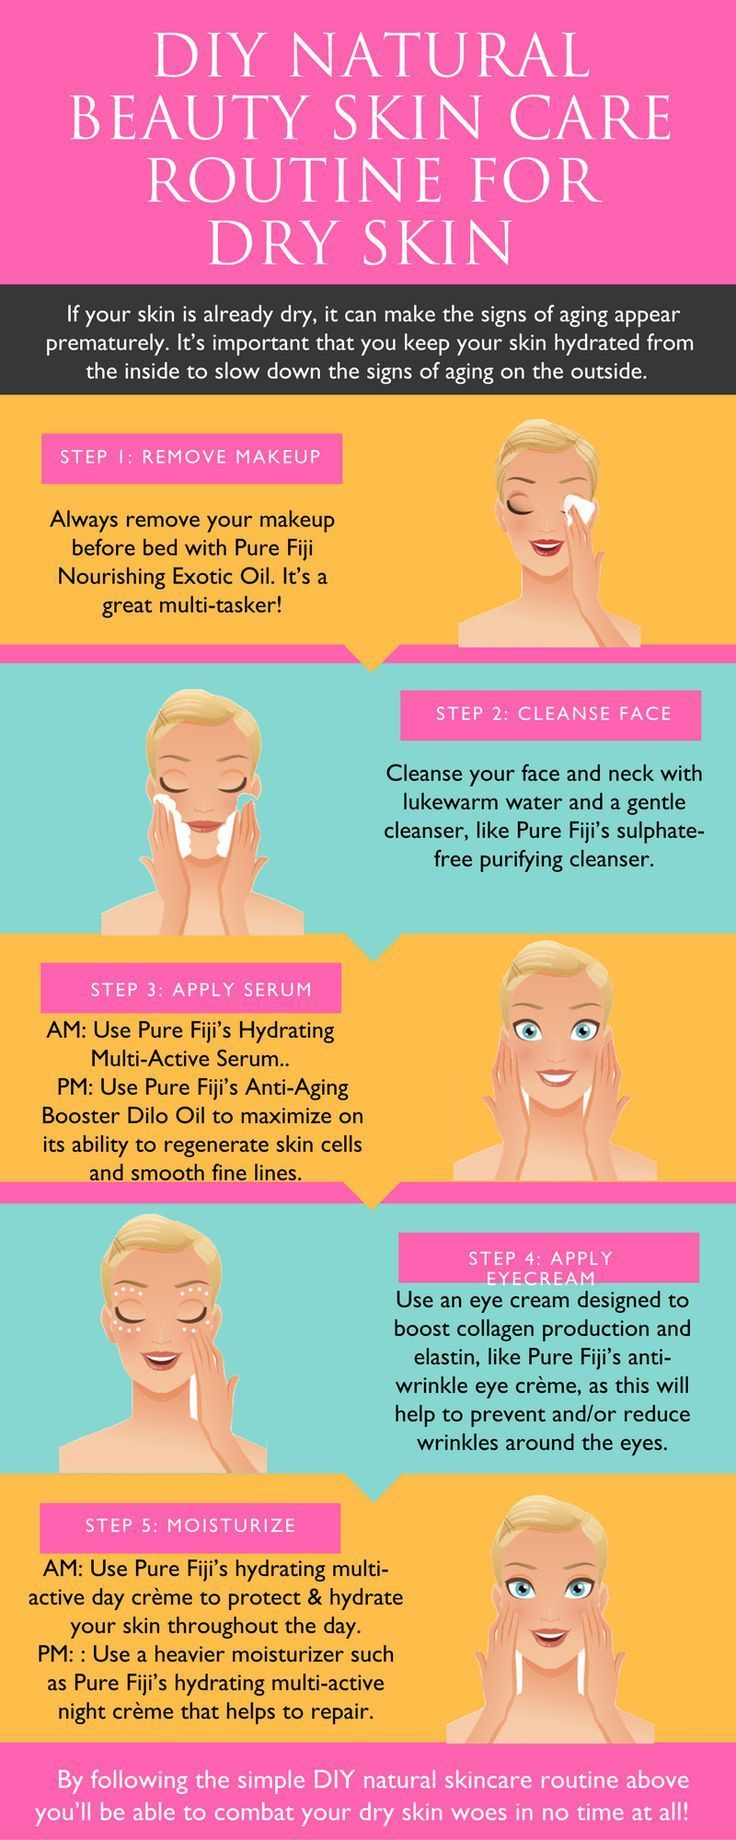 organic skin care for dry skin